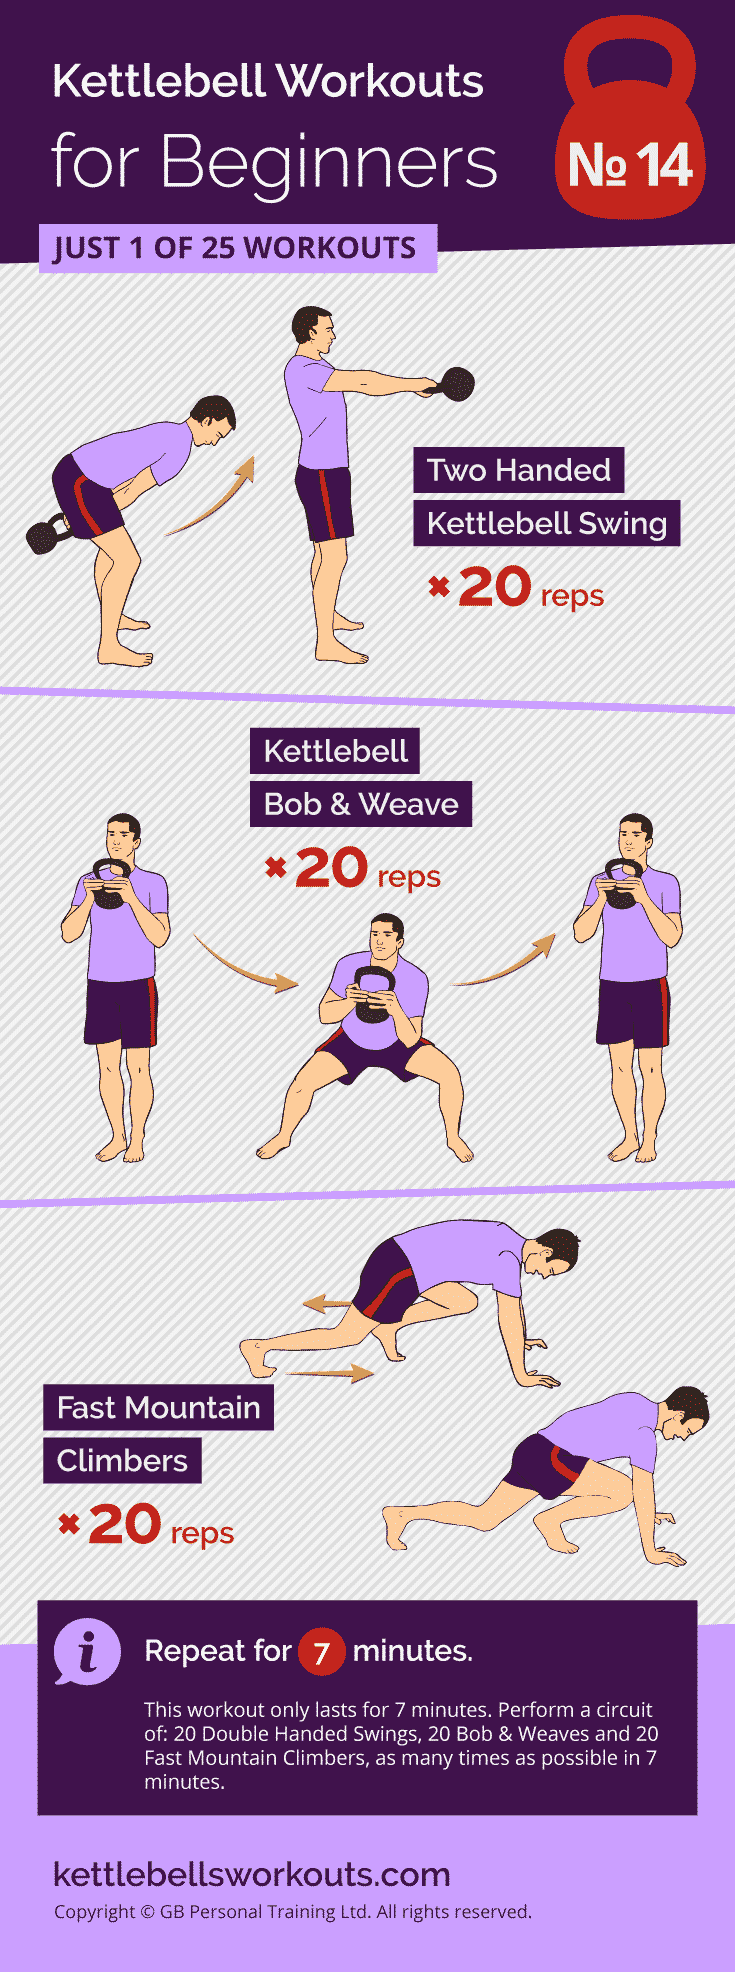 7 Minute Kettlebell Circuit